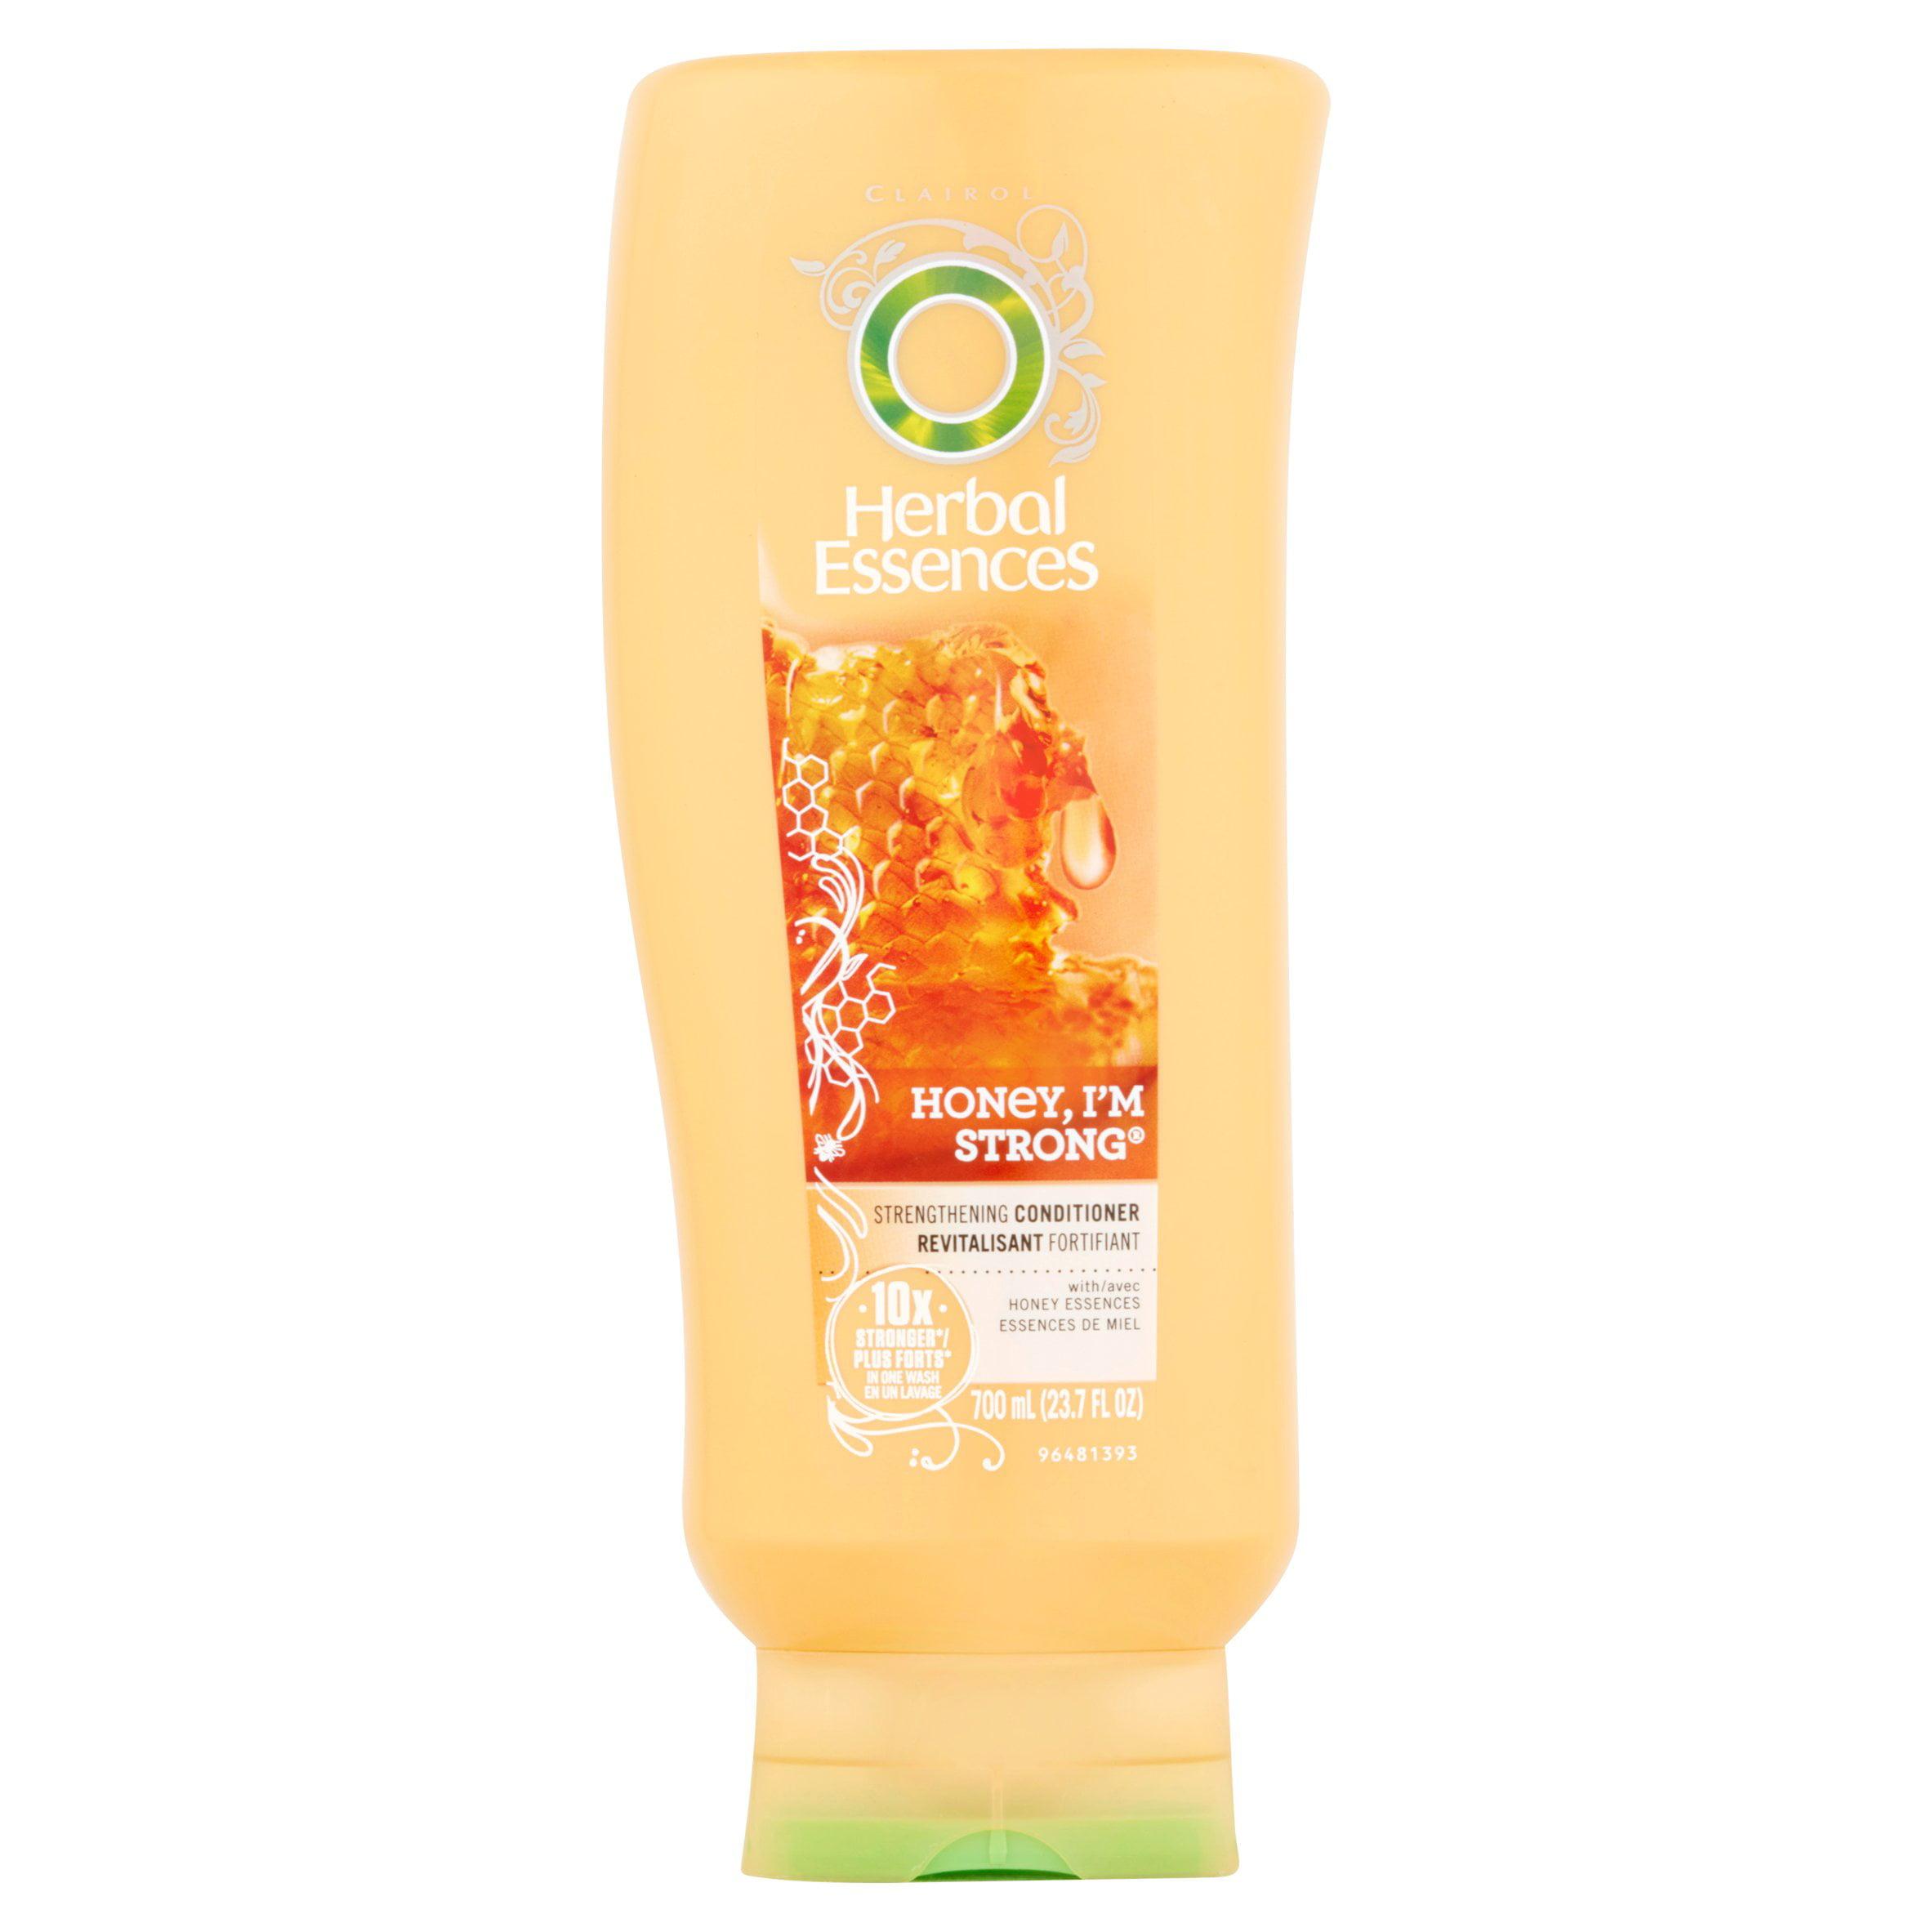 Clairol Herbal Essences Honey, I'm Strong Strengthening Conditioner with Honey Essences, 23.7 oz